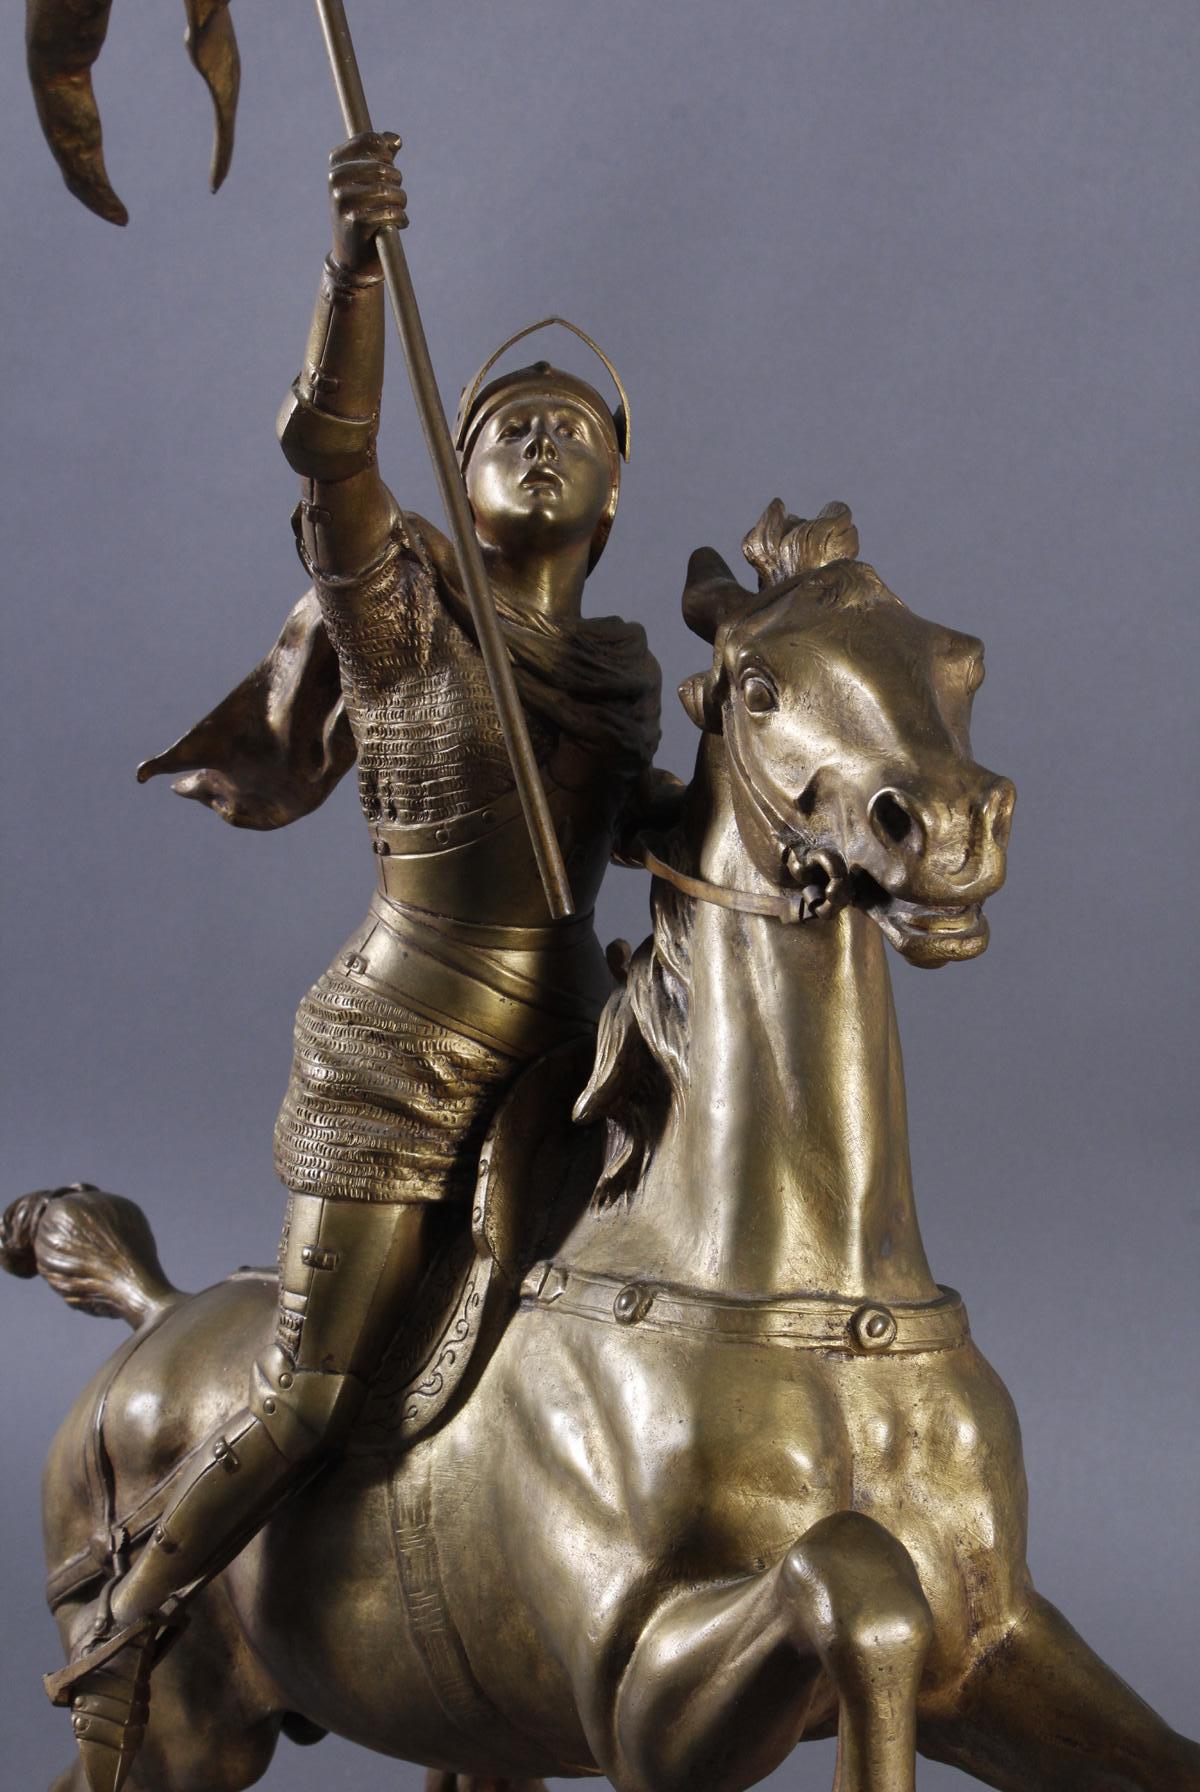 Conrad Portalis, große Bronzeskulptur auf ovalem Marmorsockel-3